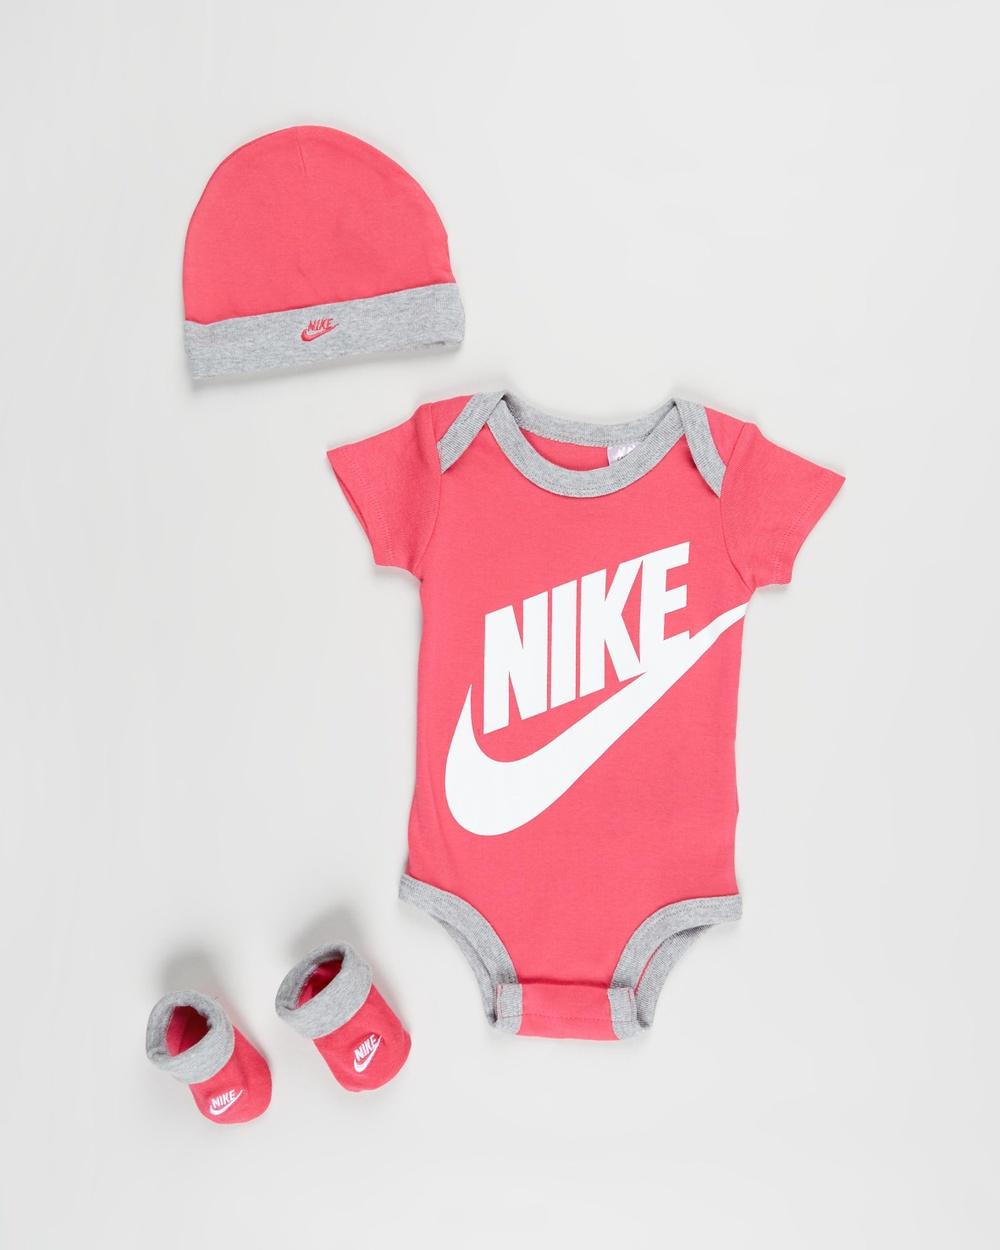 Nike Futura Logo Boxed Set Babies Headwear Pink